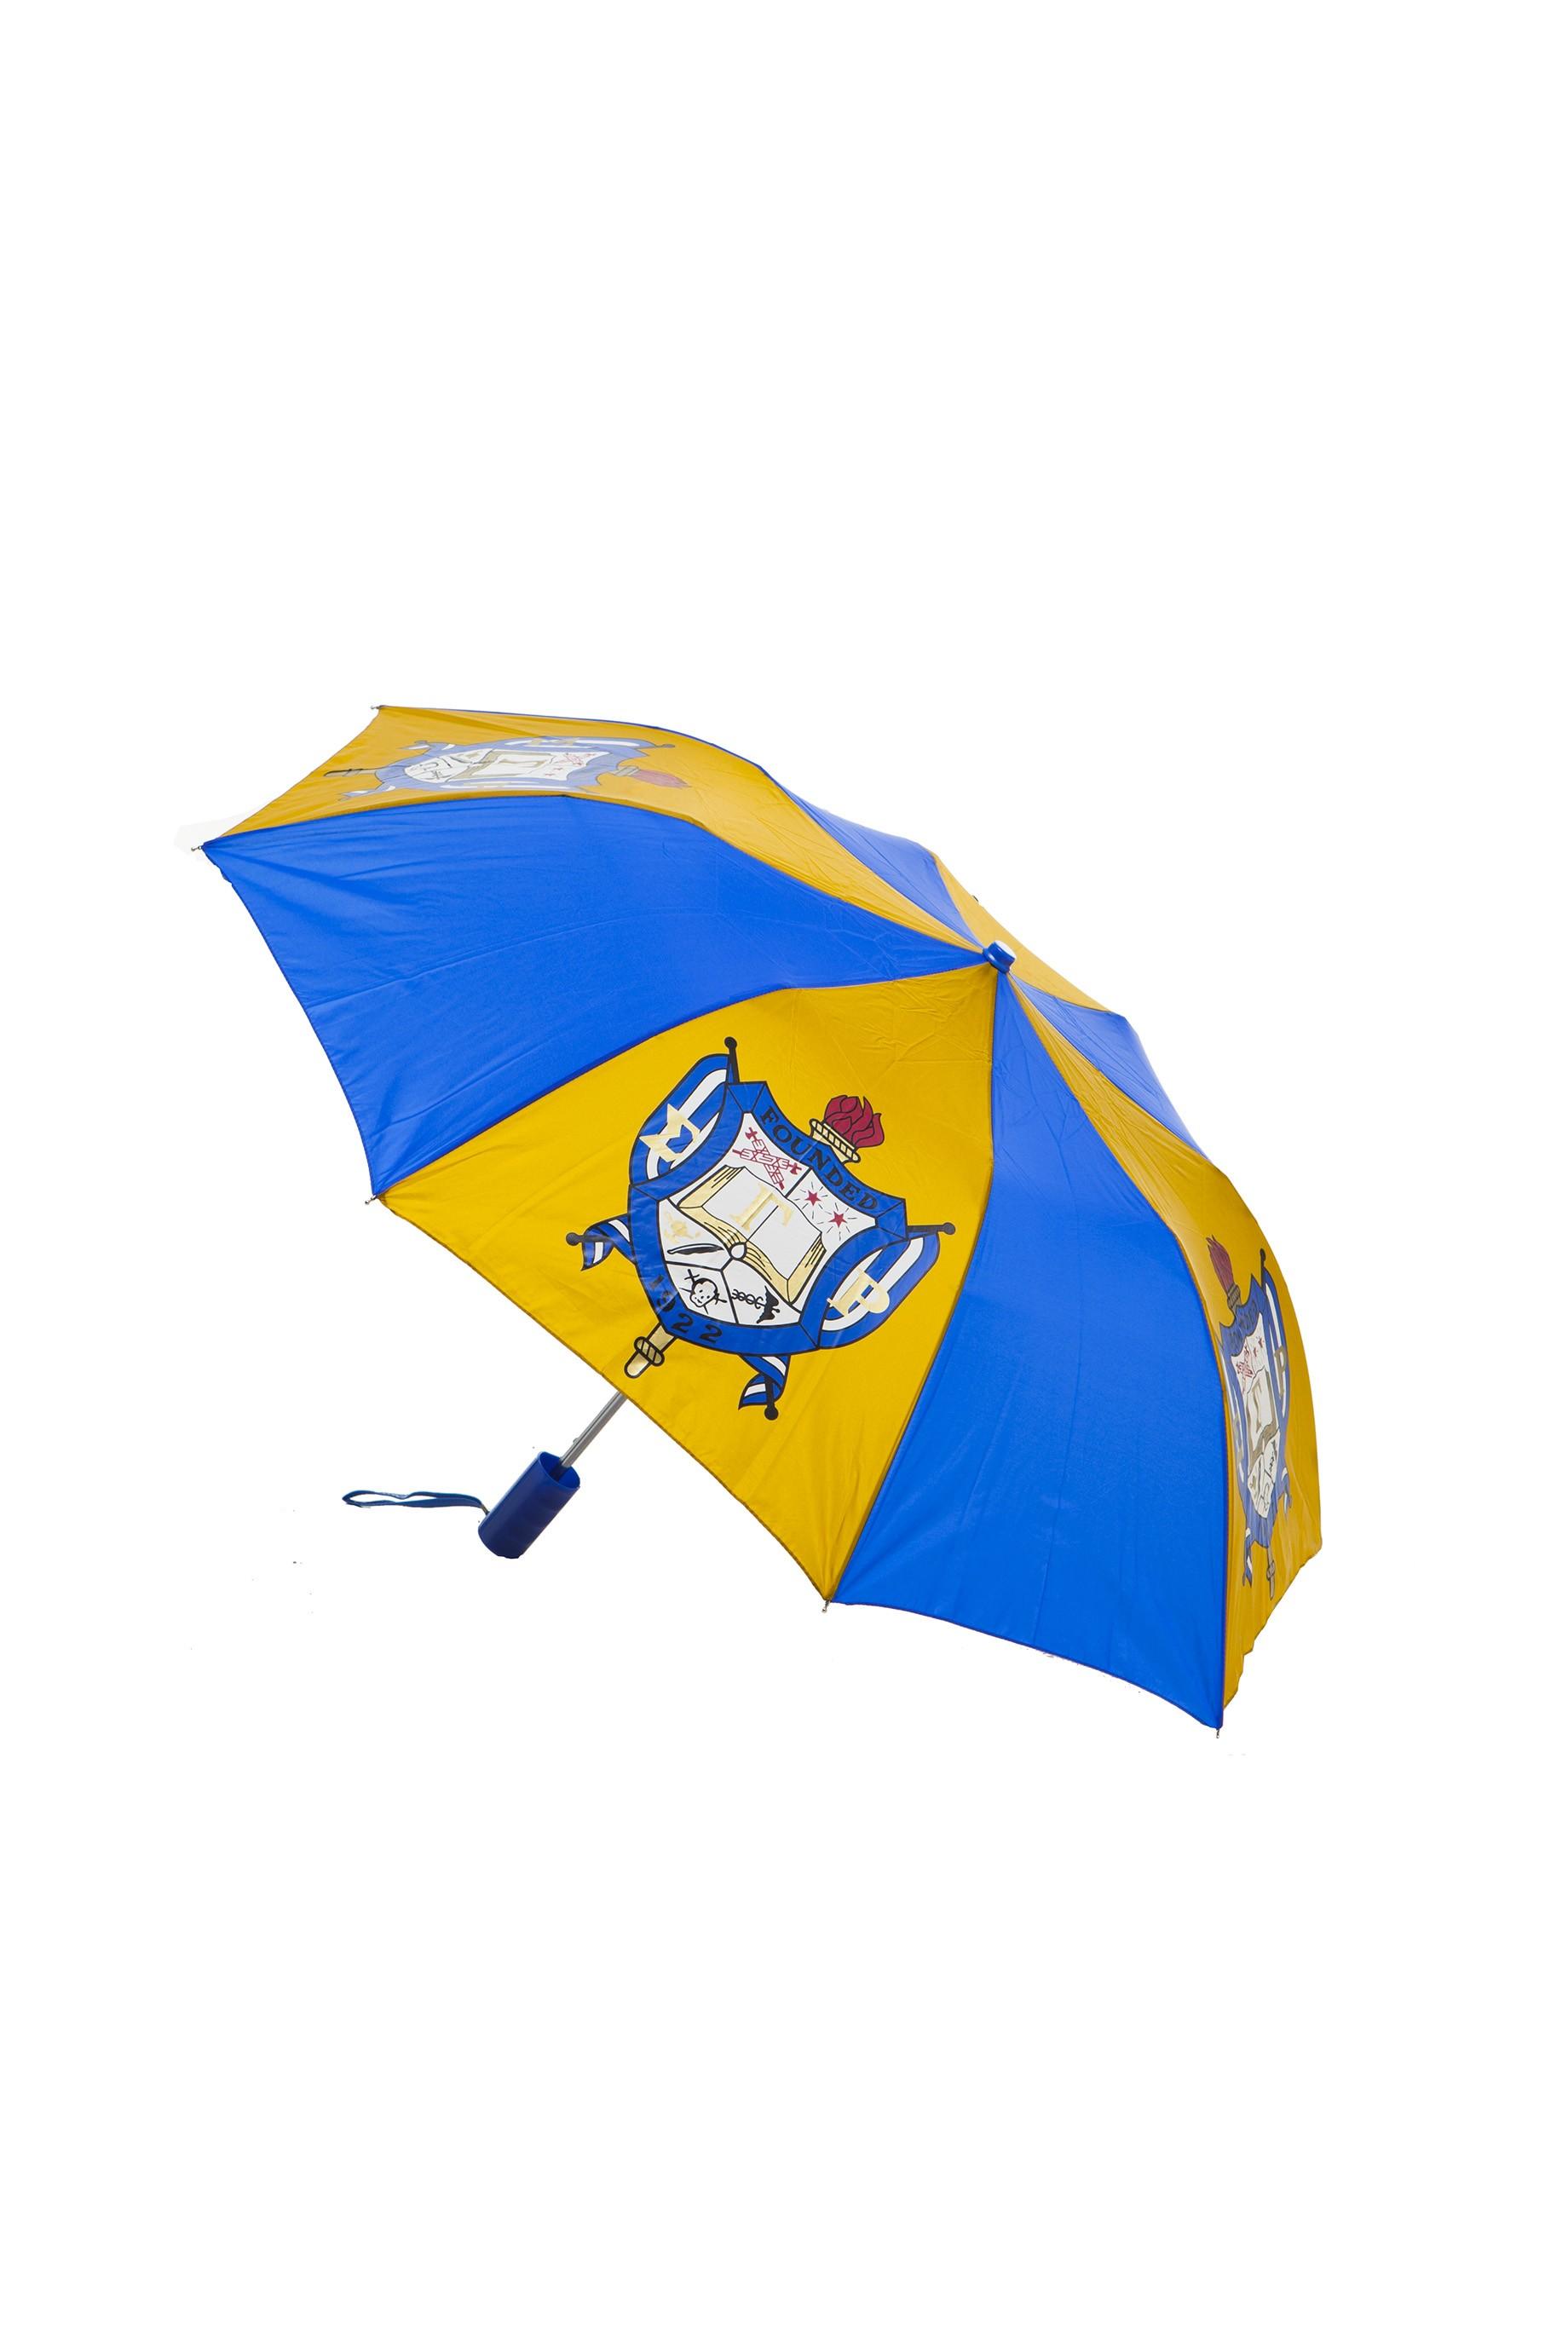 Folding Umbrella 10 Inch Shield-Sigma Gamma Rho